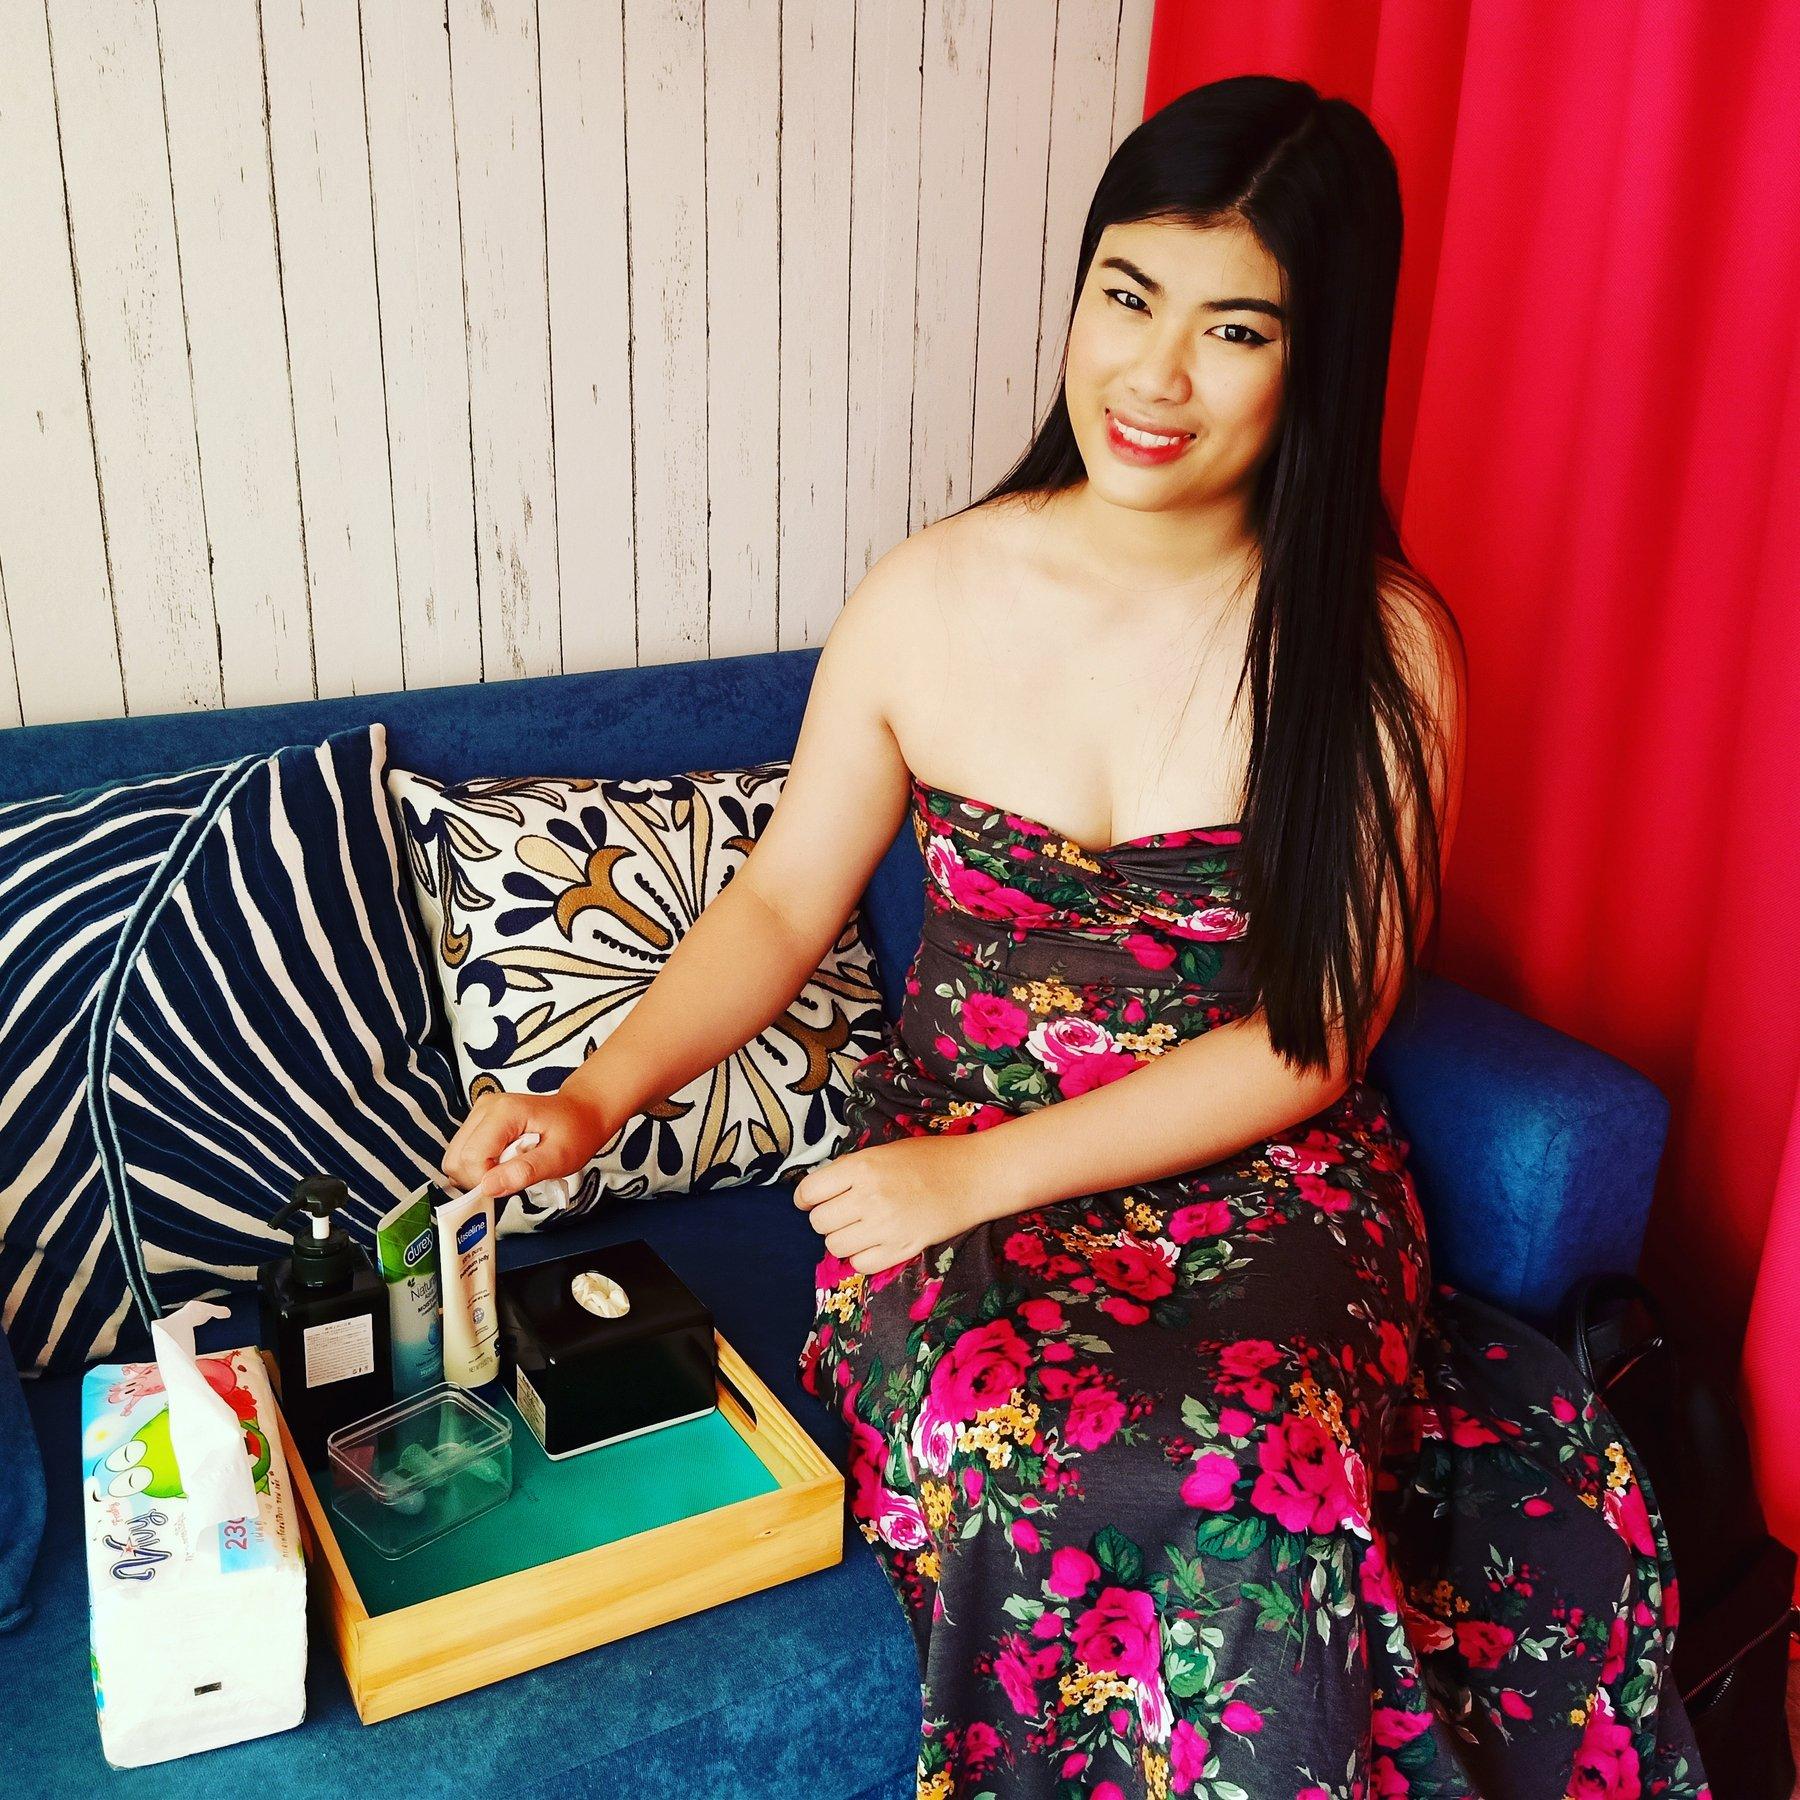 Tantric 4 Hands Massage, Thai masseuse in Bangkok